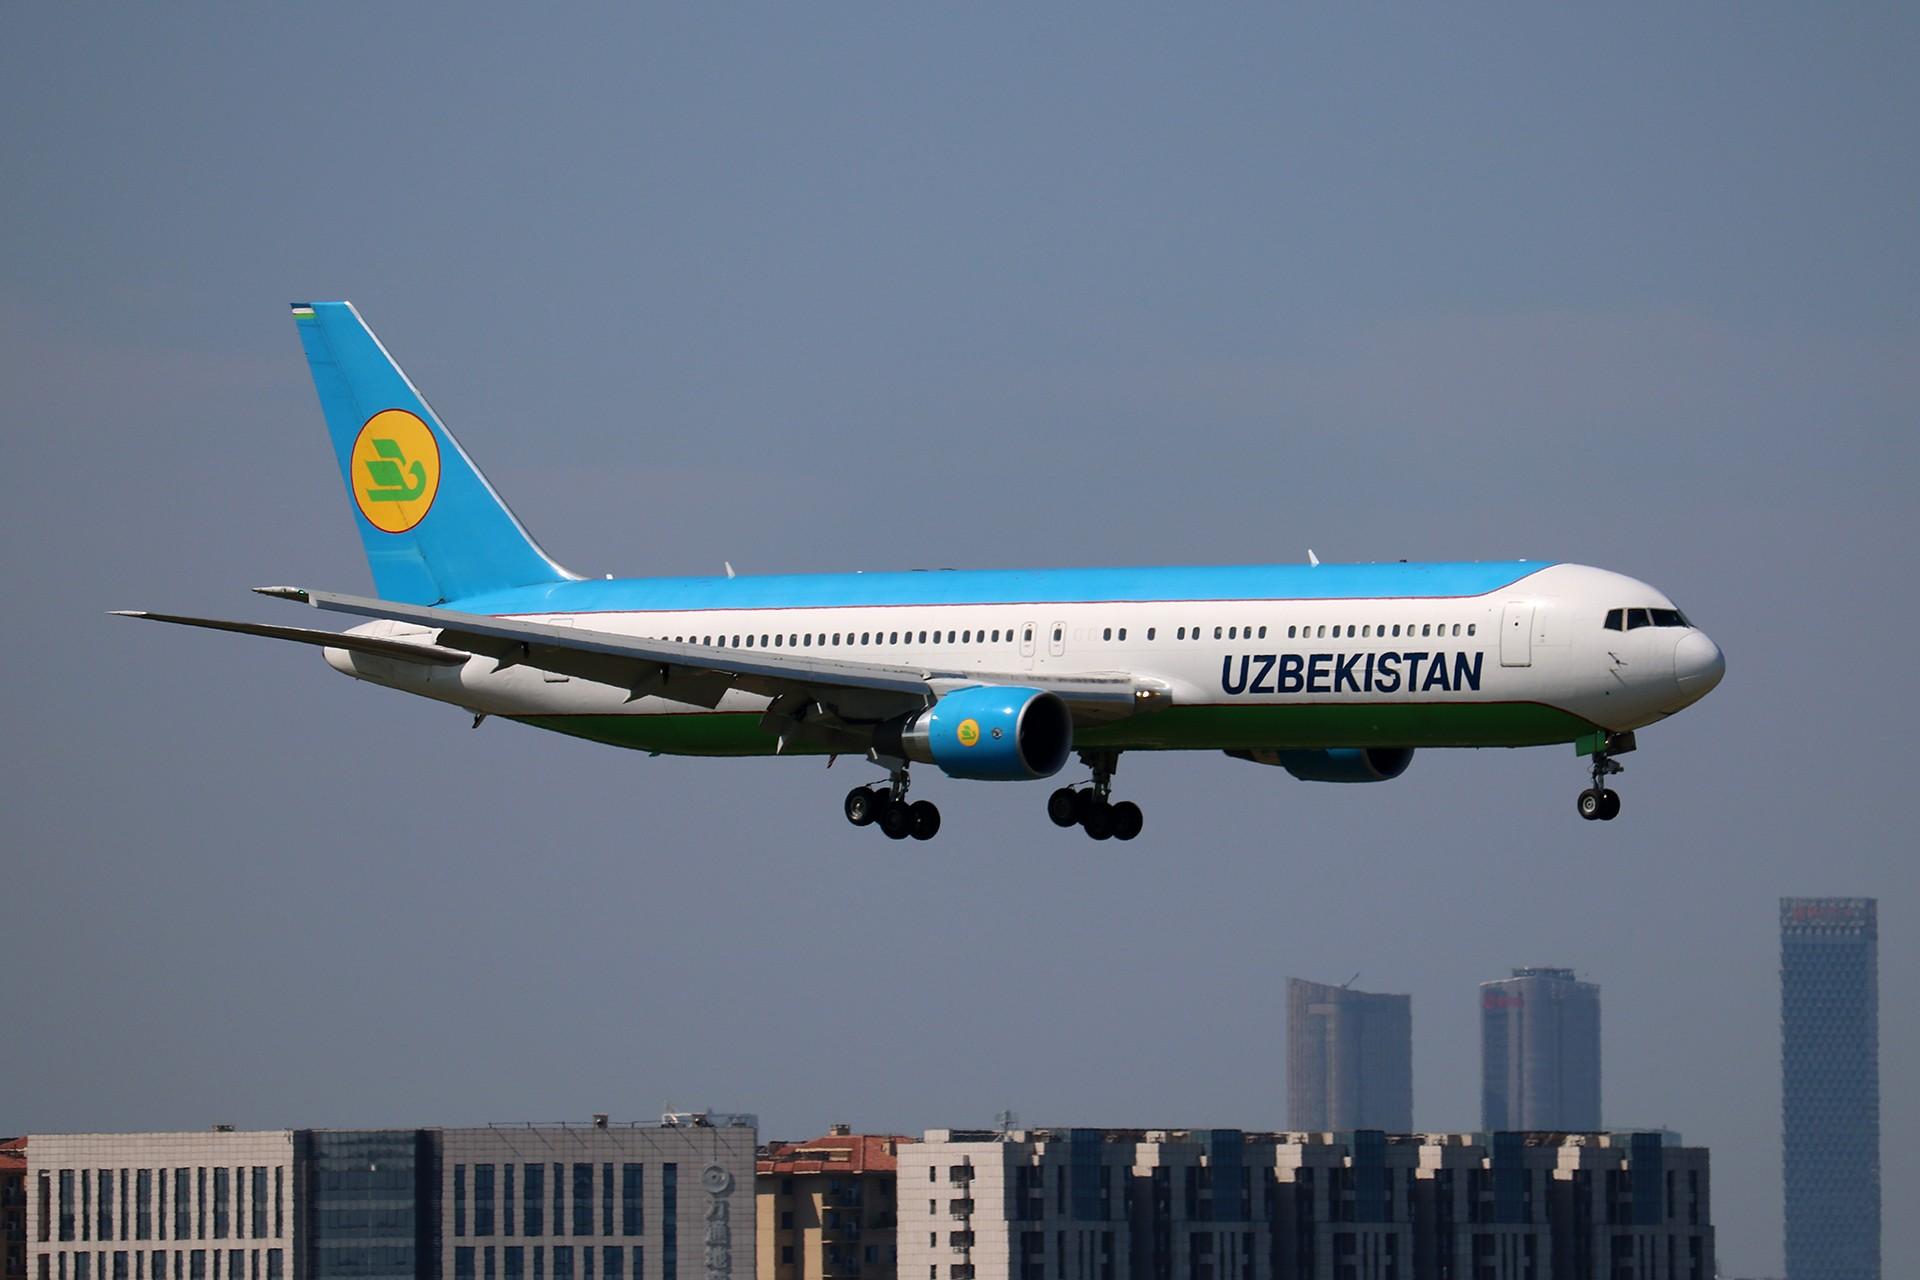 Re:[原创]LIULIU|【PEK】36L降落一组Ⅴ|城市背景下的进近 BOEING 767-300ER UK-67003 中国北京首都国际机场